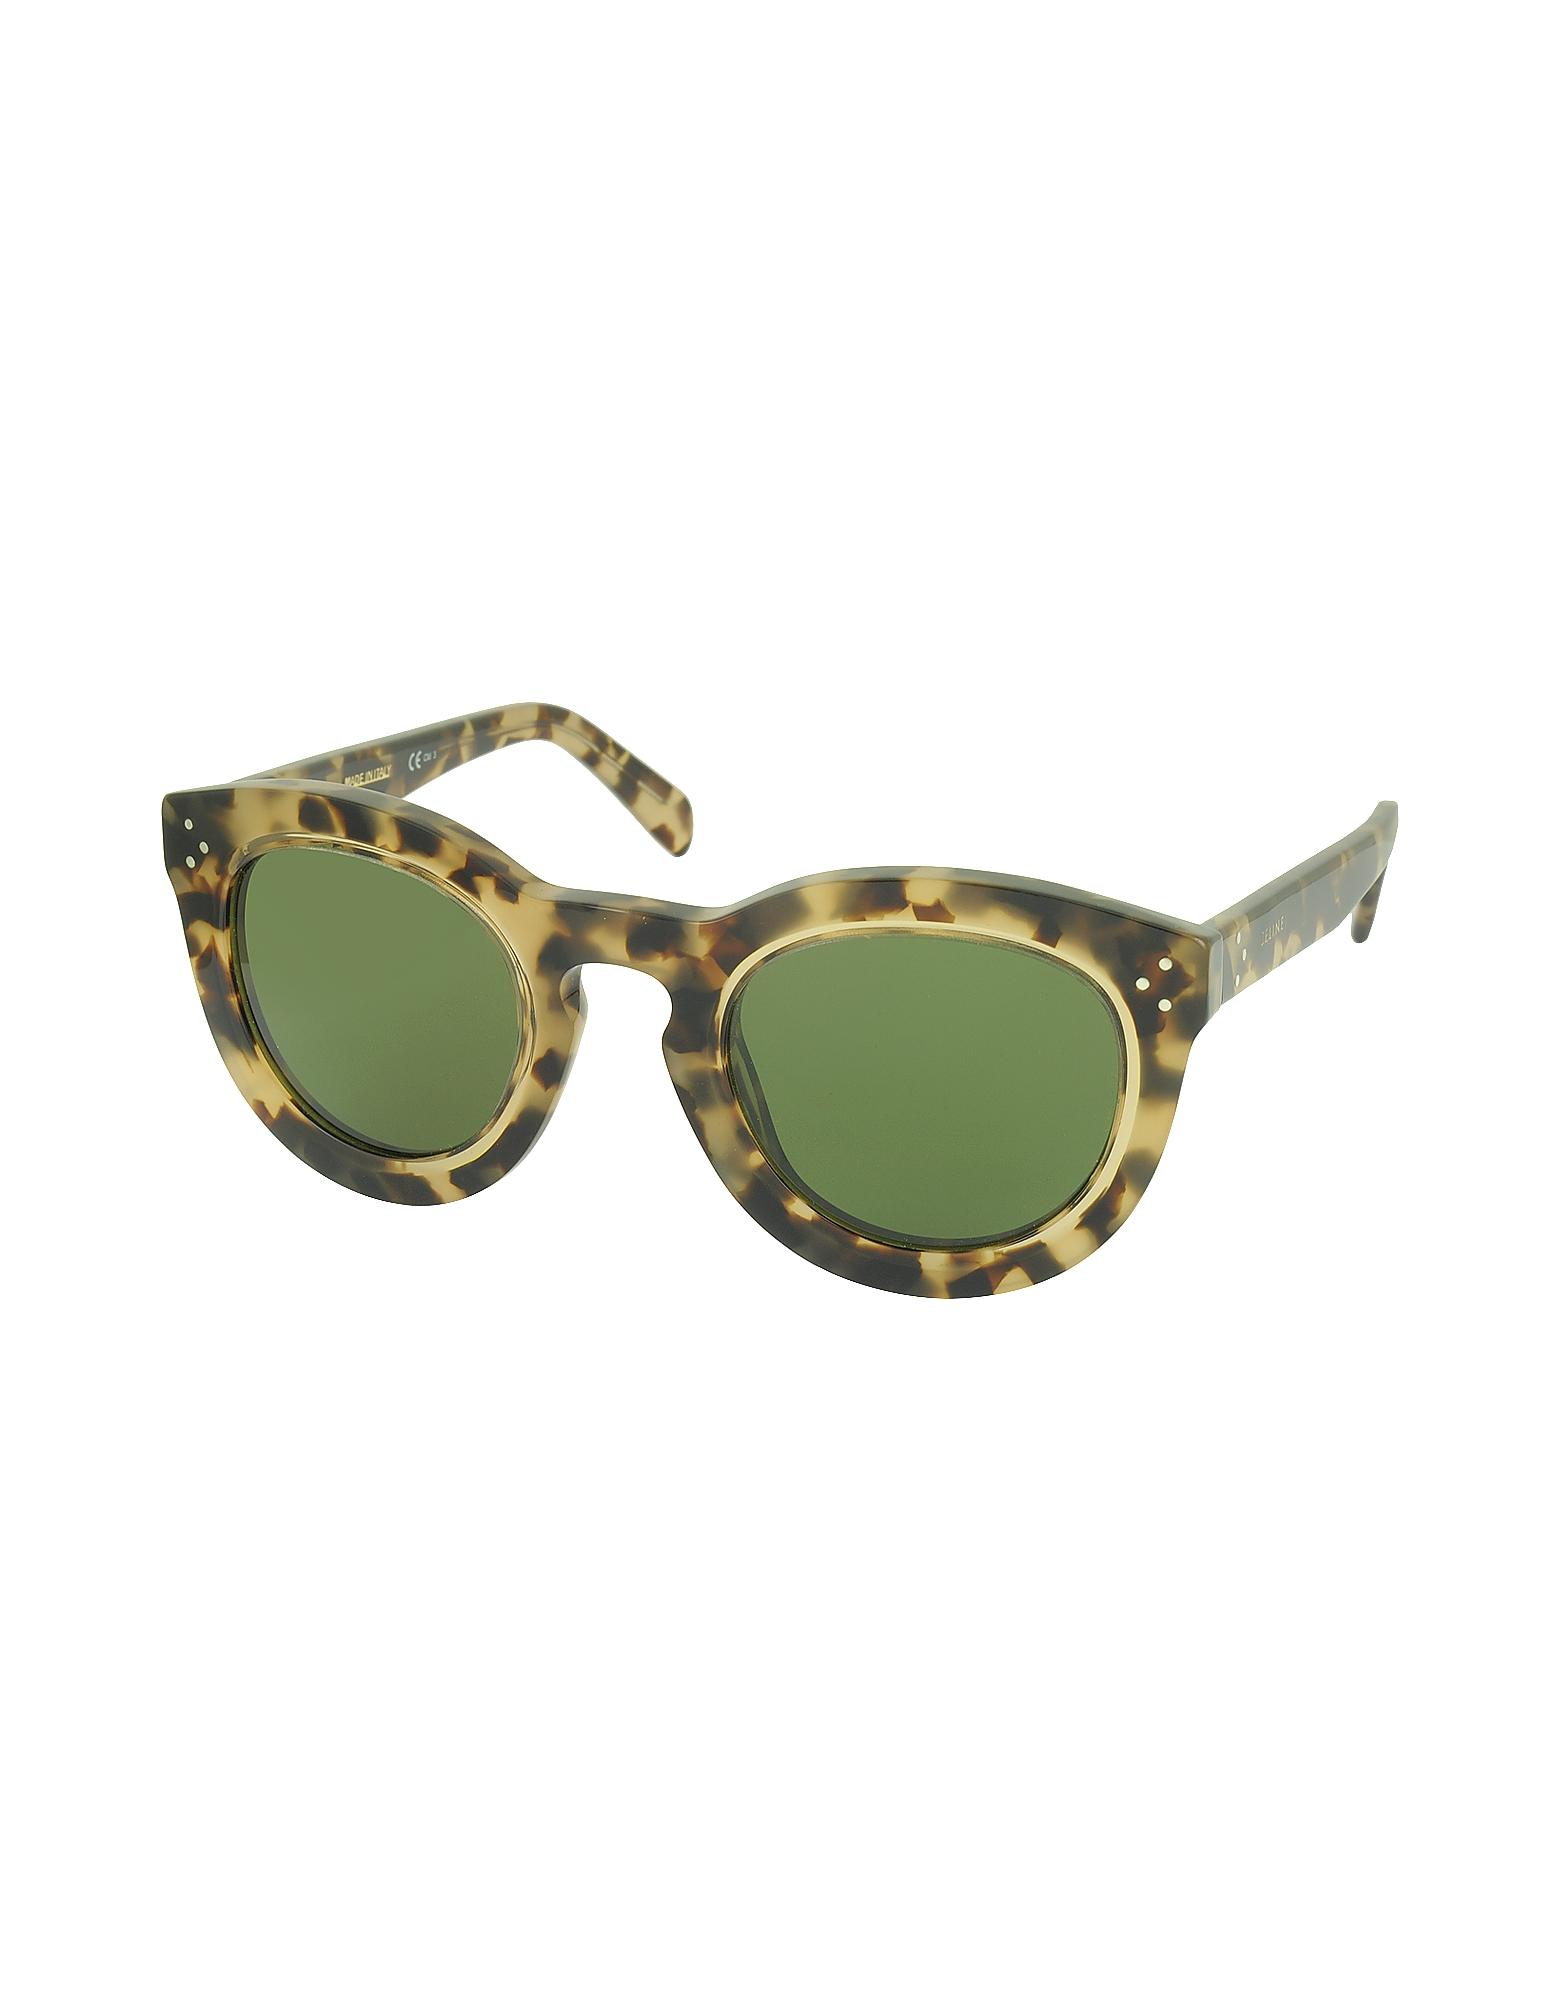 AGNES CL 41403/S T7H1E Havana Acetate Round Women's Sunglasses от Forzieri.com INT